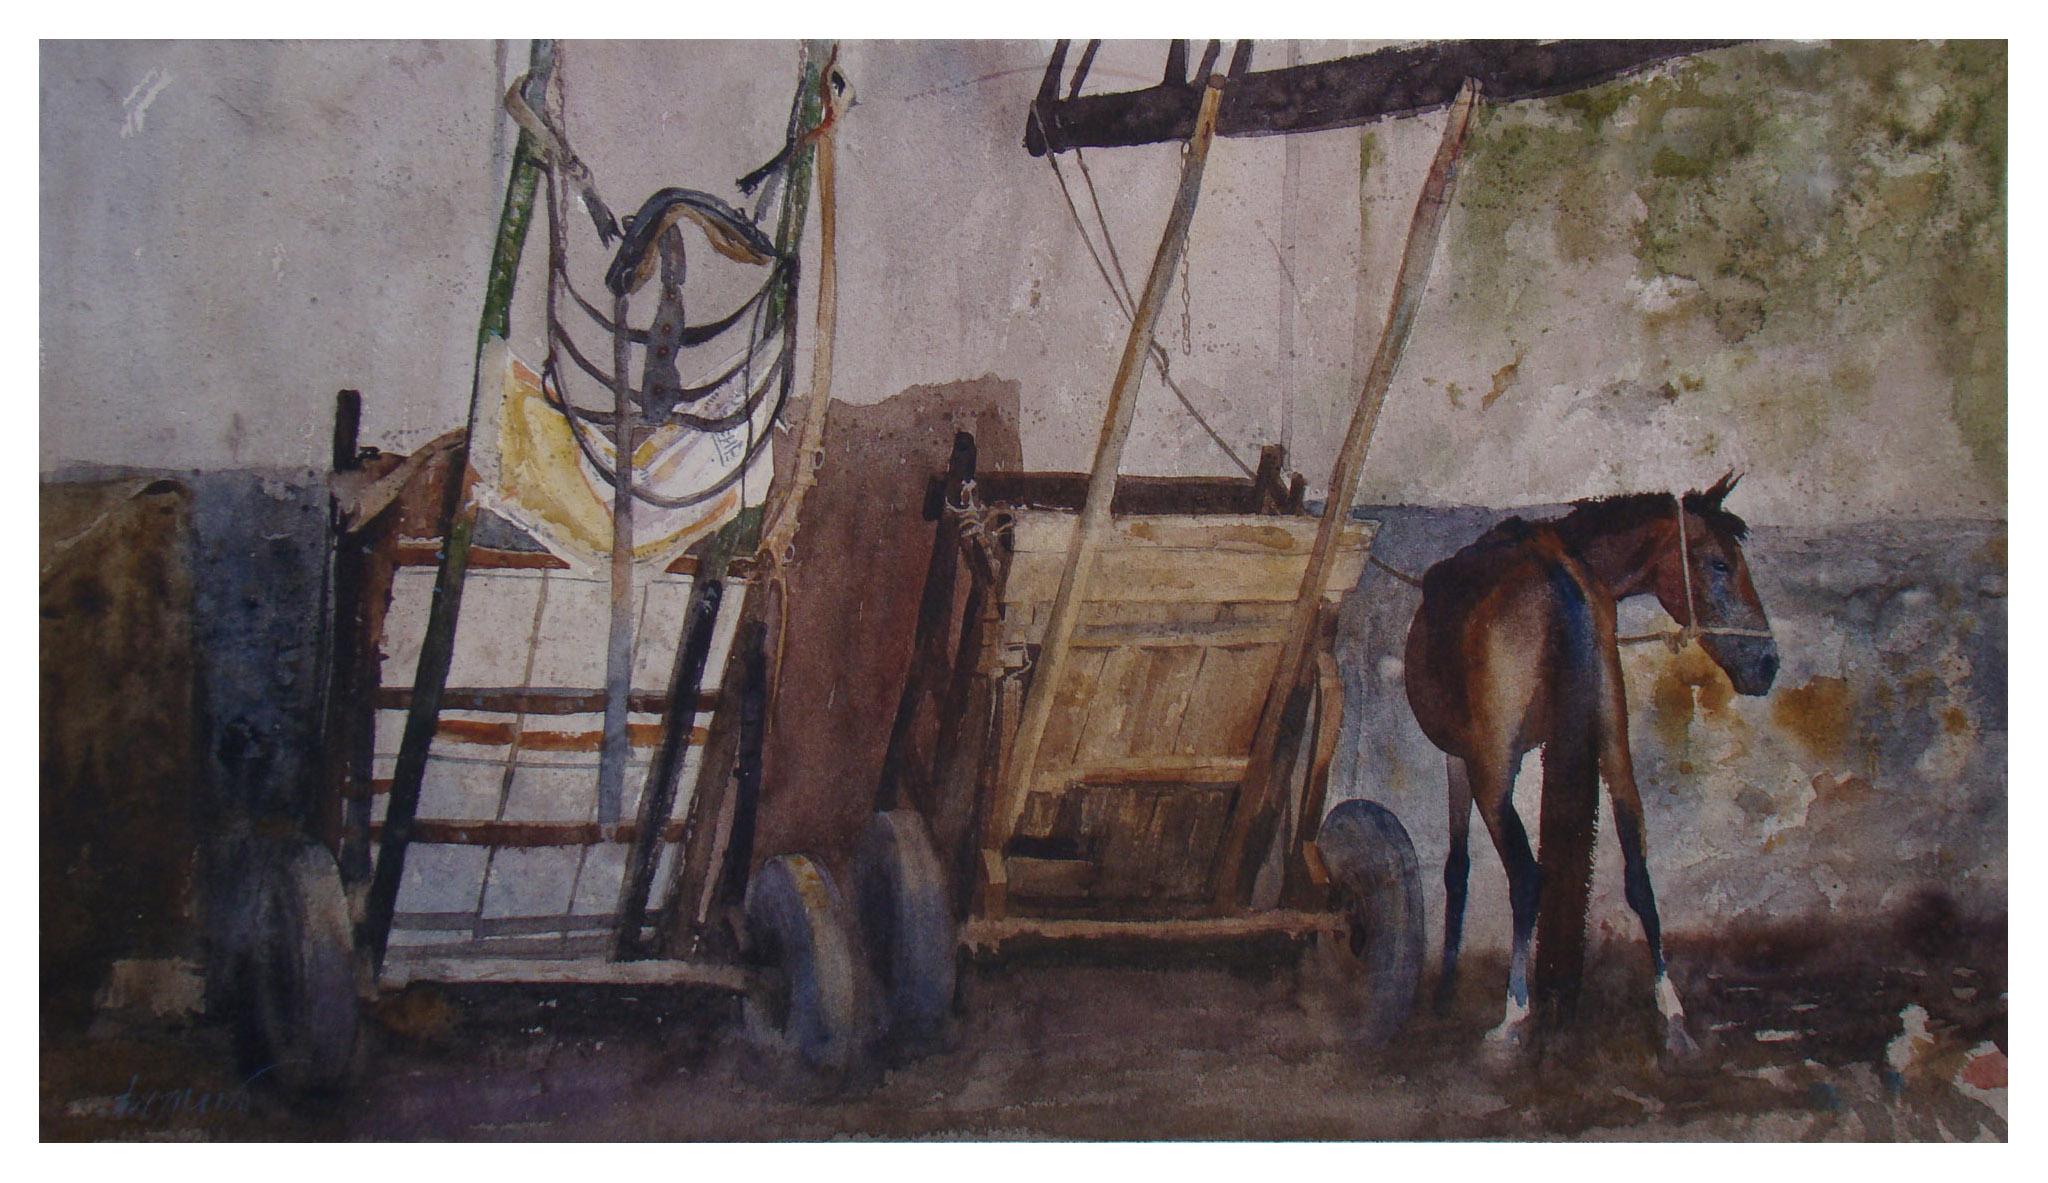 Carroças e cavalo na cocheira